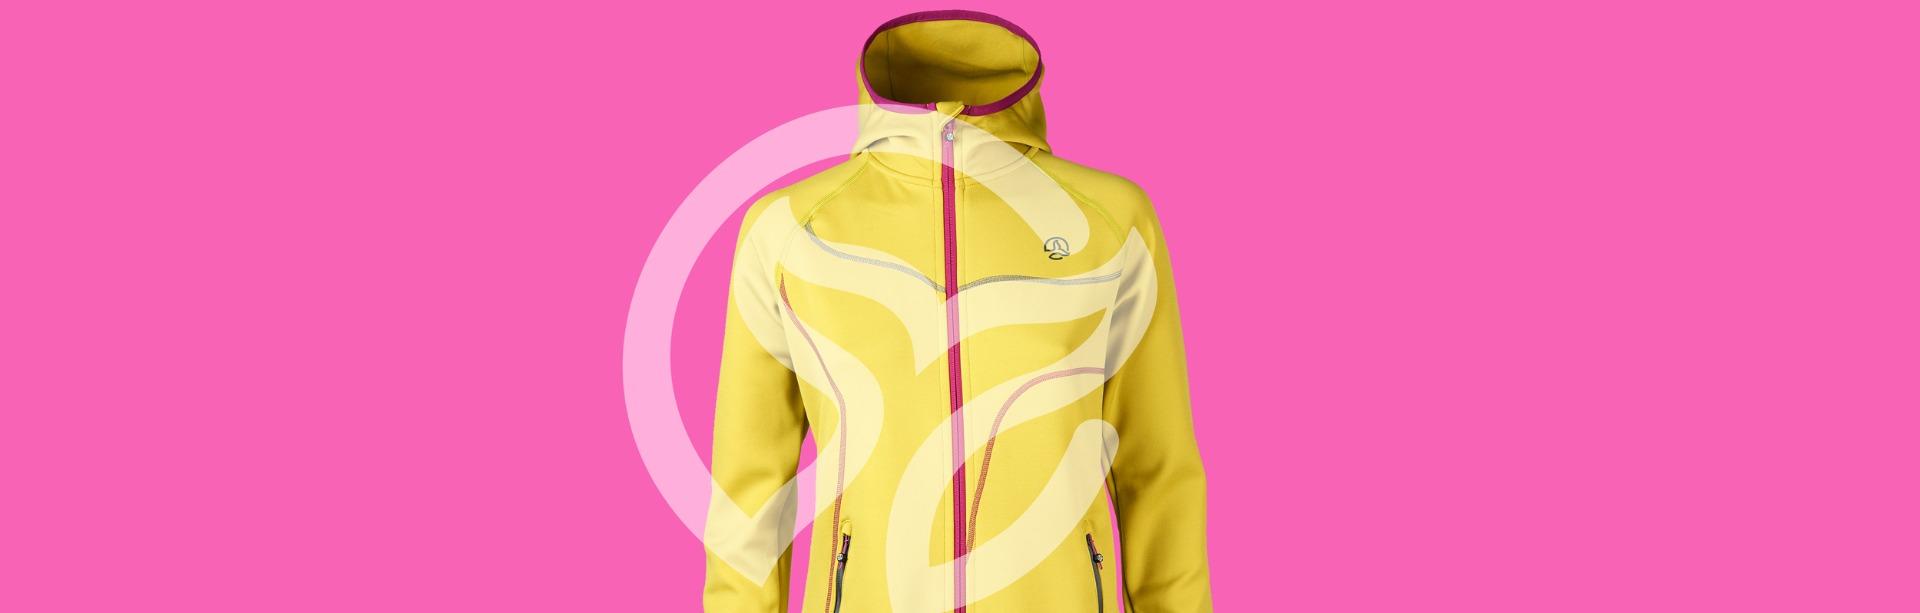 Altitoy jacket